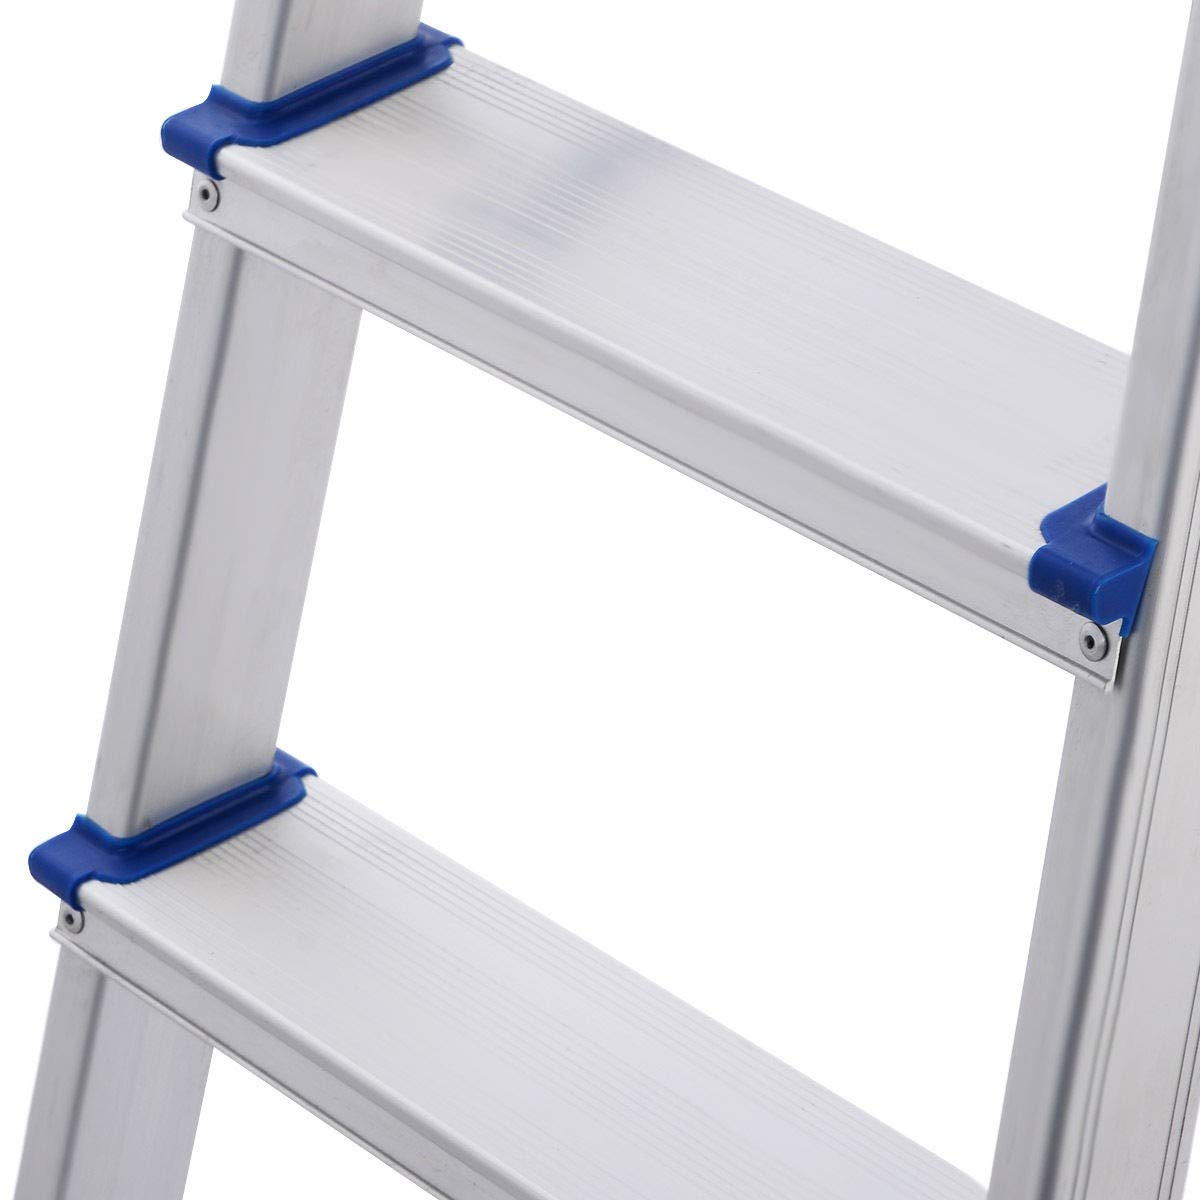 Foldable 5 Step Ladder Non-slip 330 lbs Capacity Platform Aluminum New